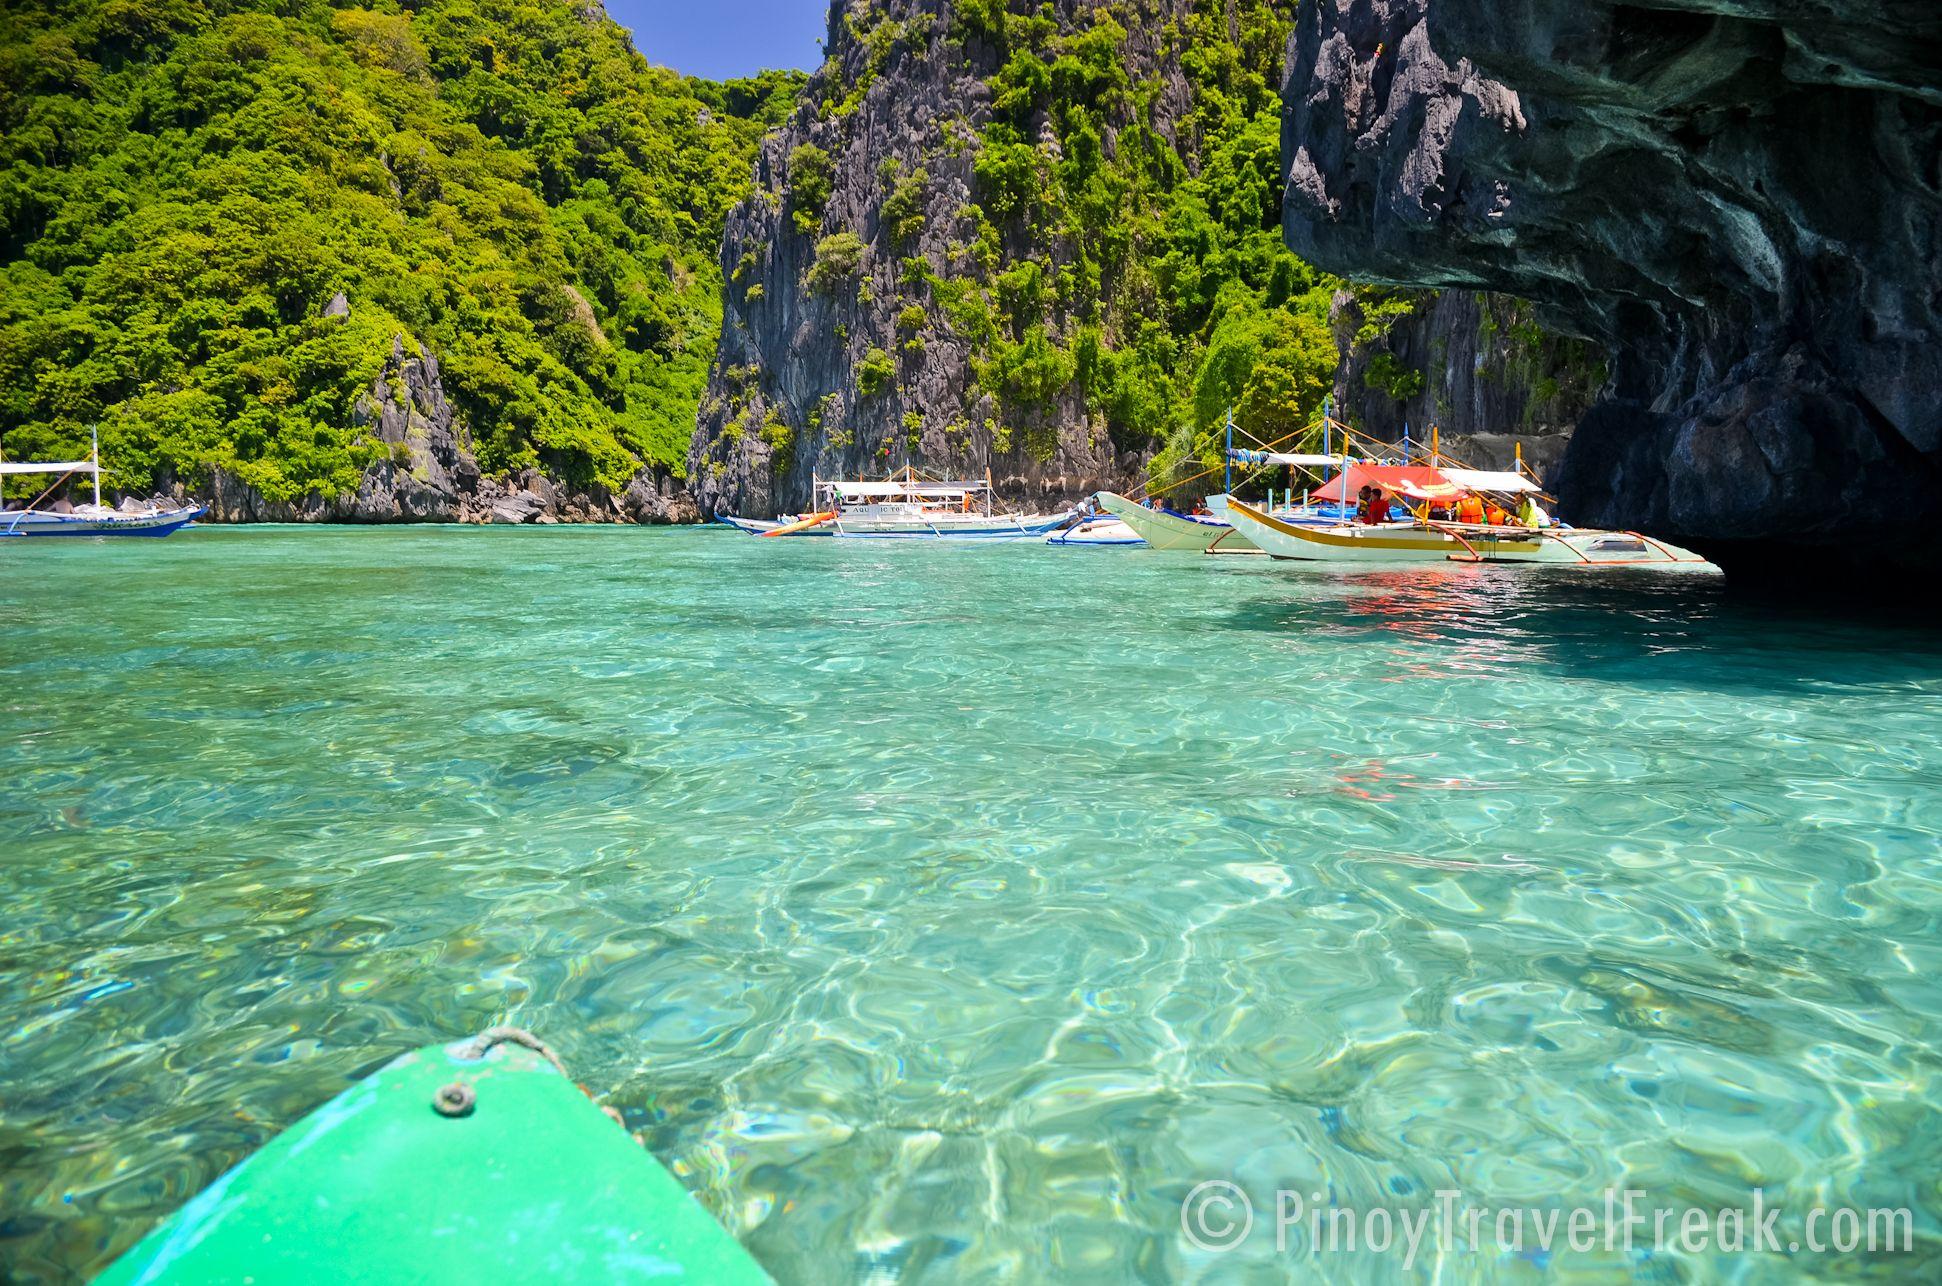 Baclayan Beach, San Jose, Occidental Mindoro - Philippines - Pinterest